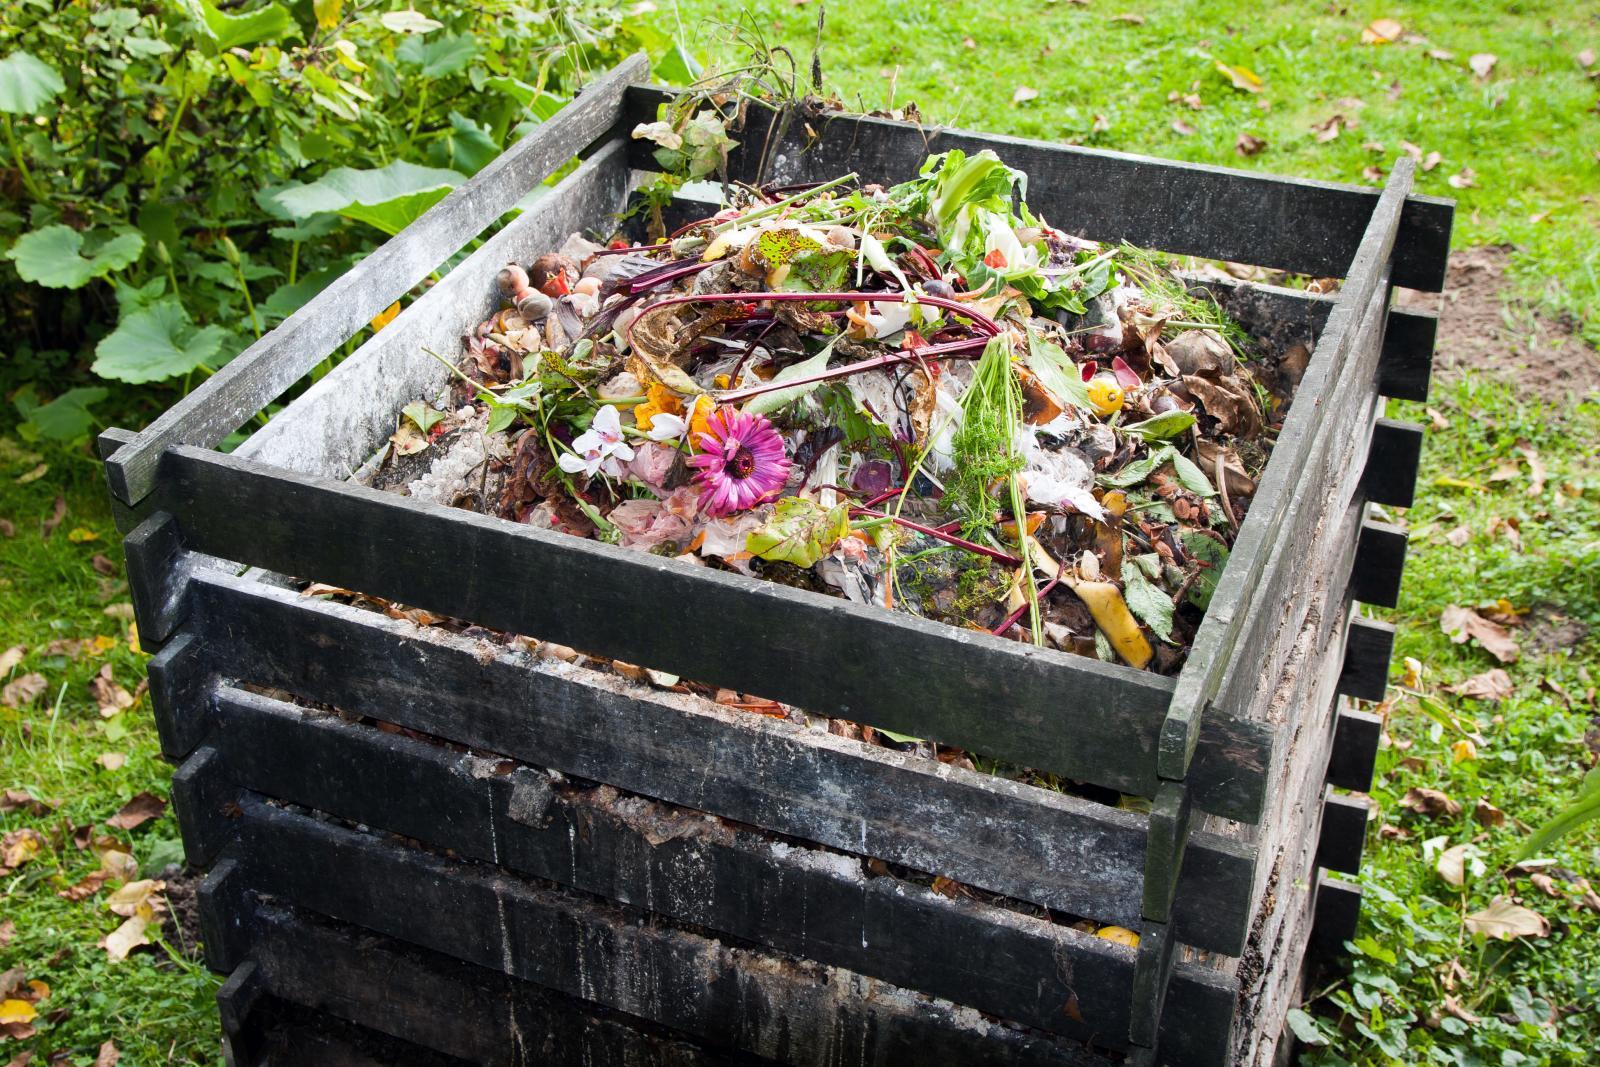 Get composting - a compost bin